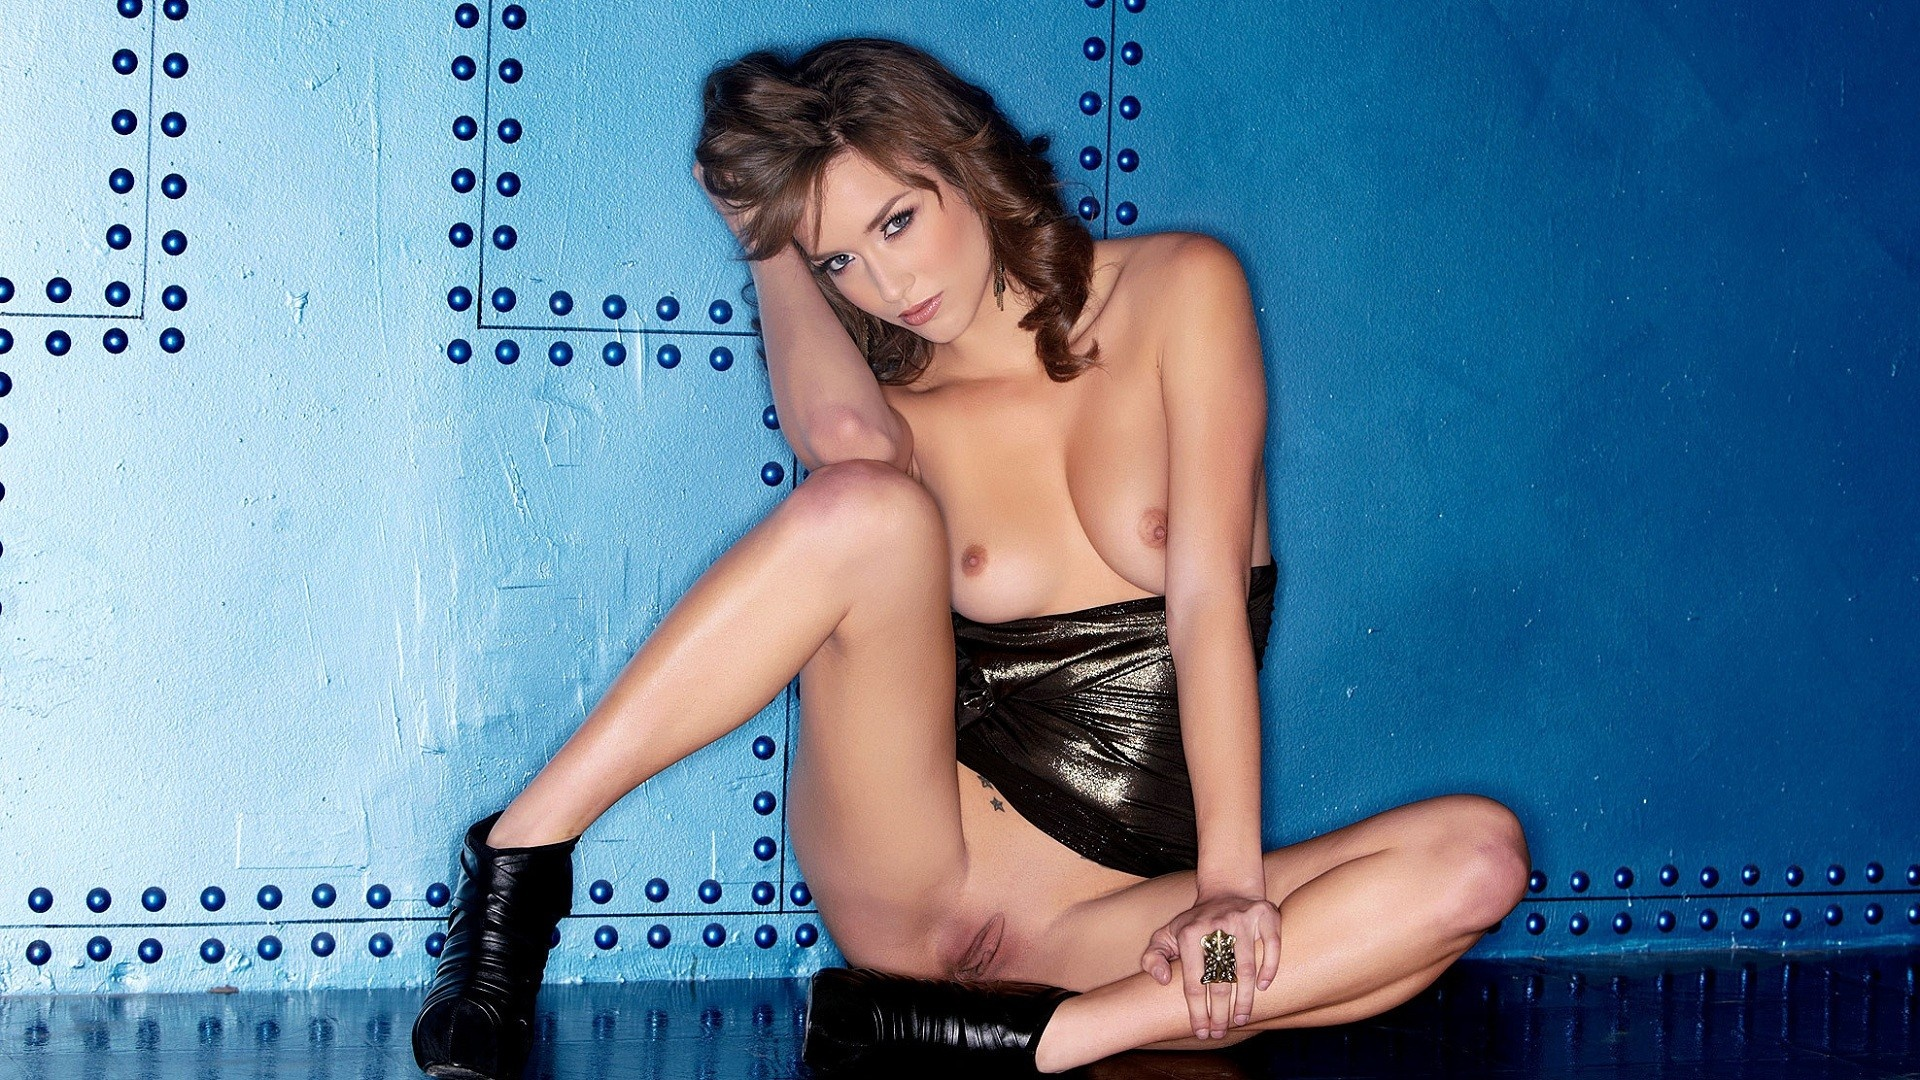 nude ipad wallpapers Sexy